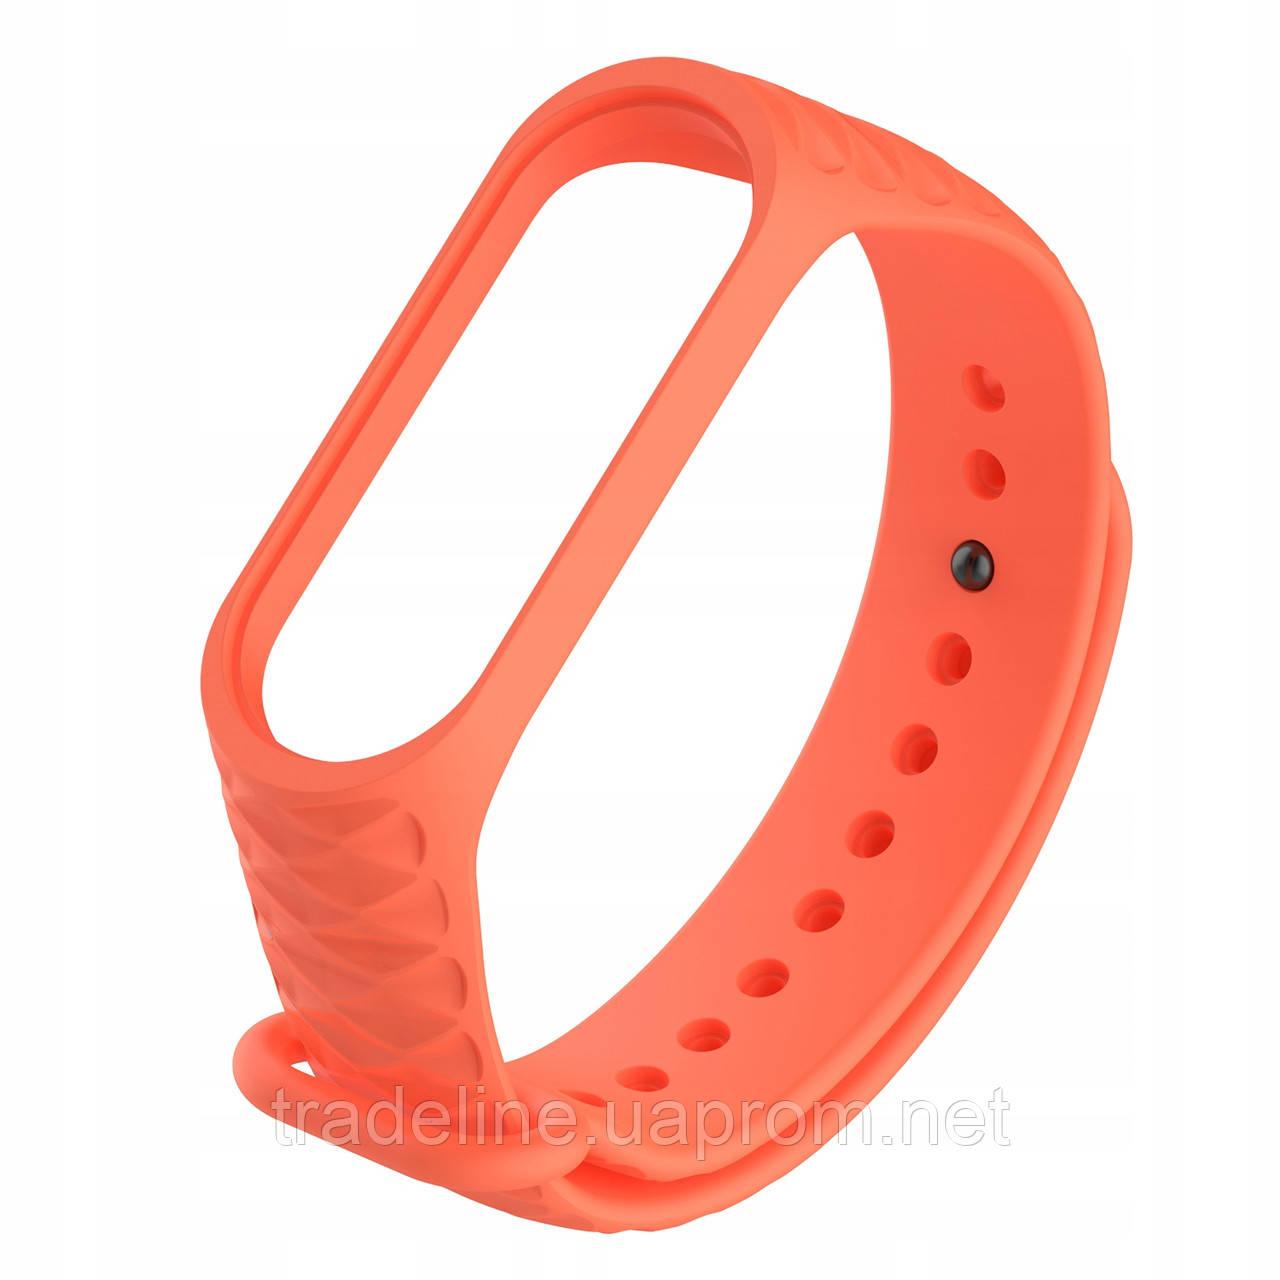 Ремешок Gasta Fluted for Xiaomi Mi Band 3 color Orange